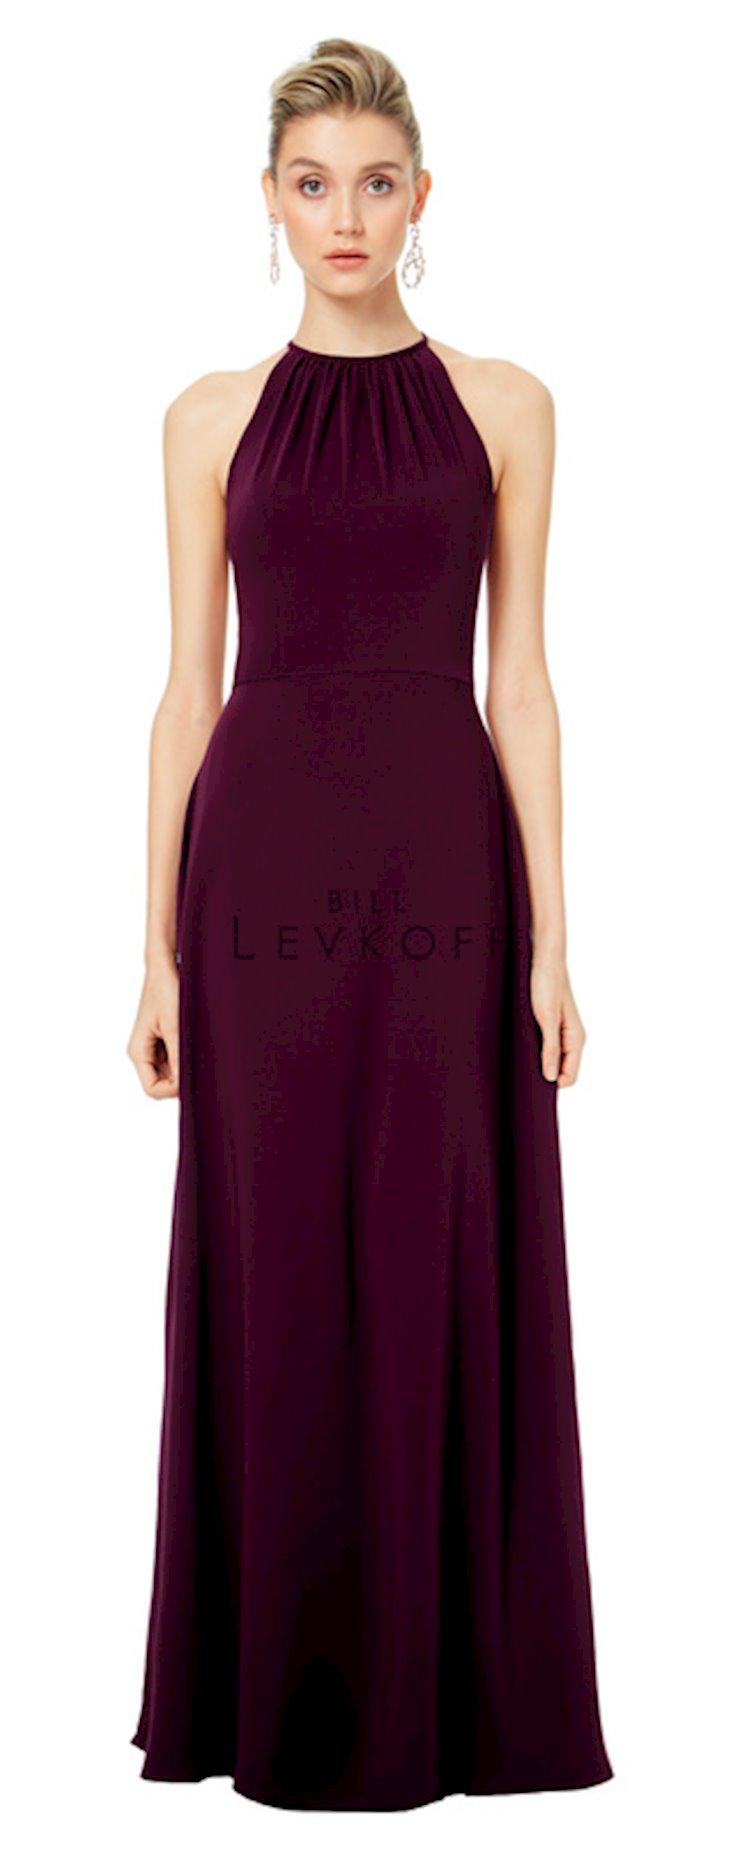 Bill Levkoff Style #1513